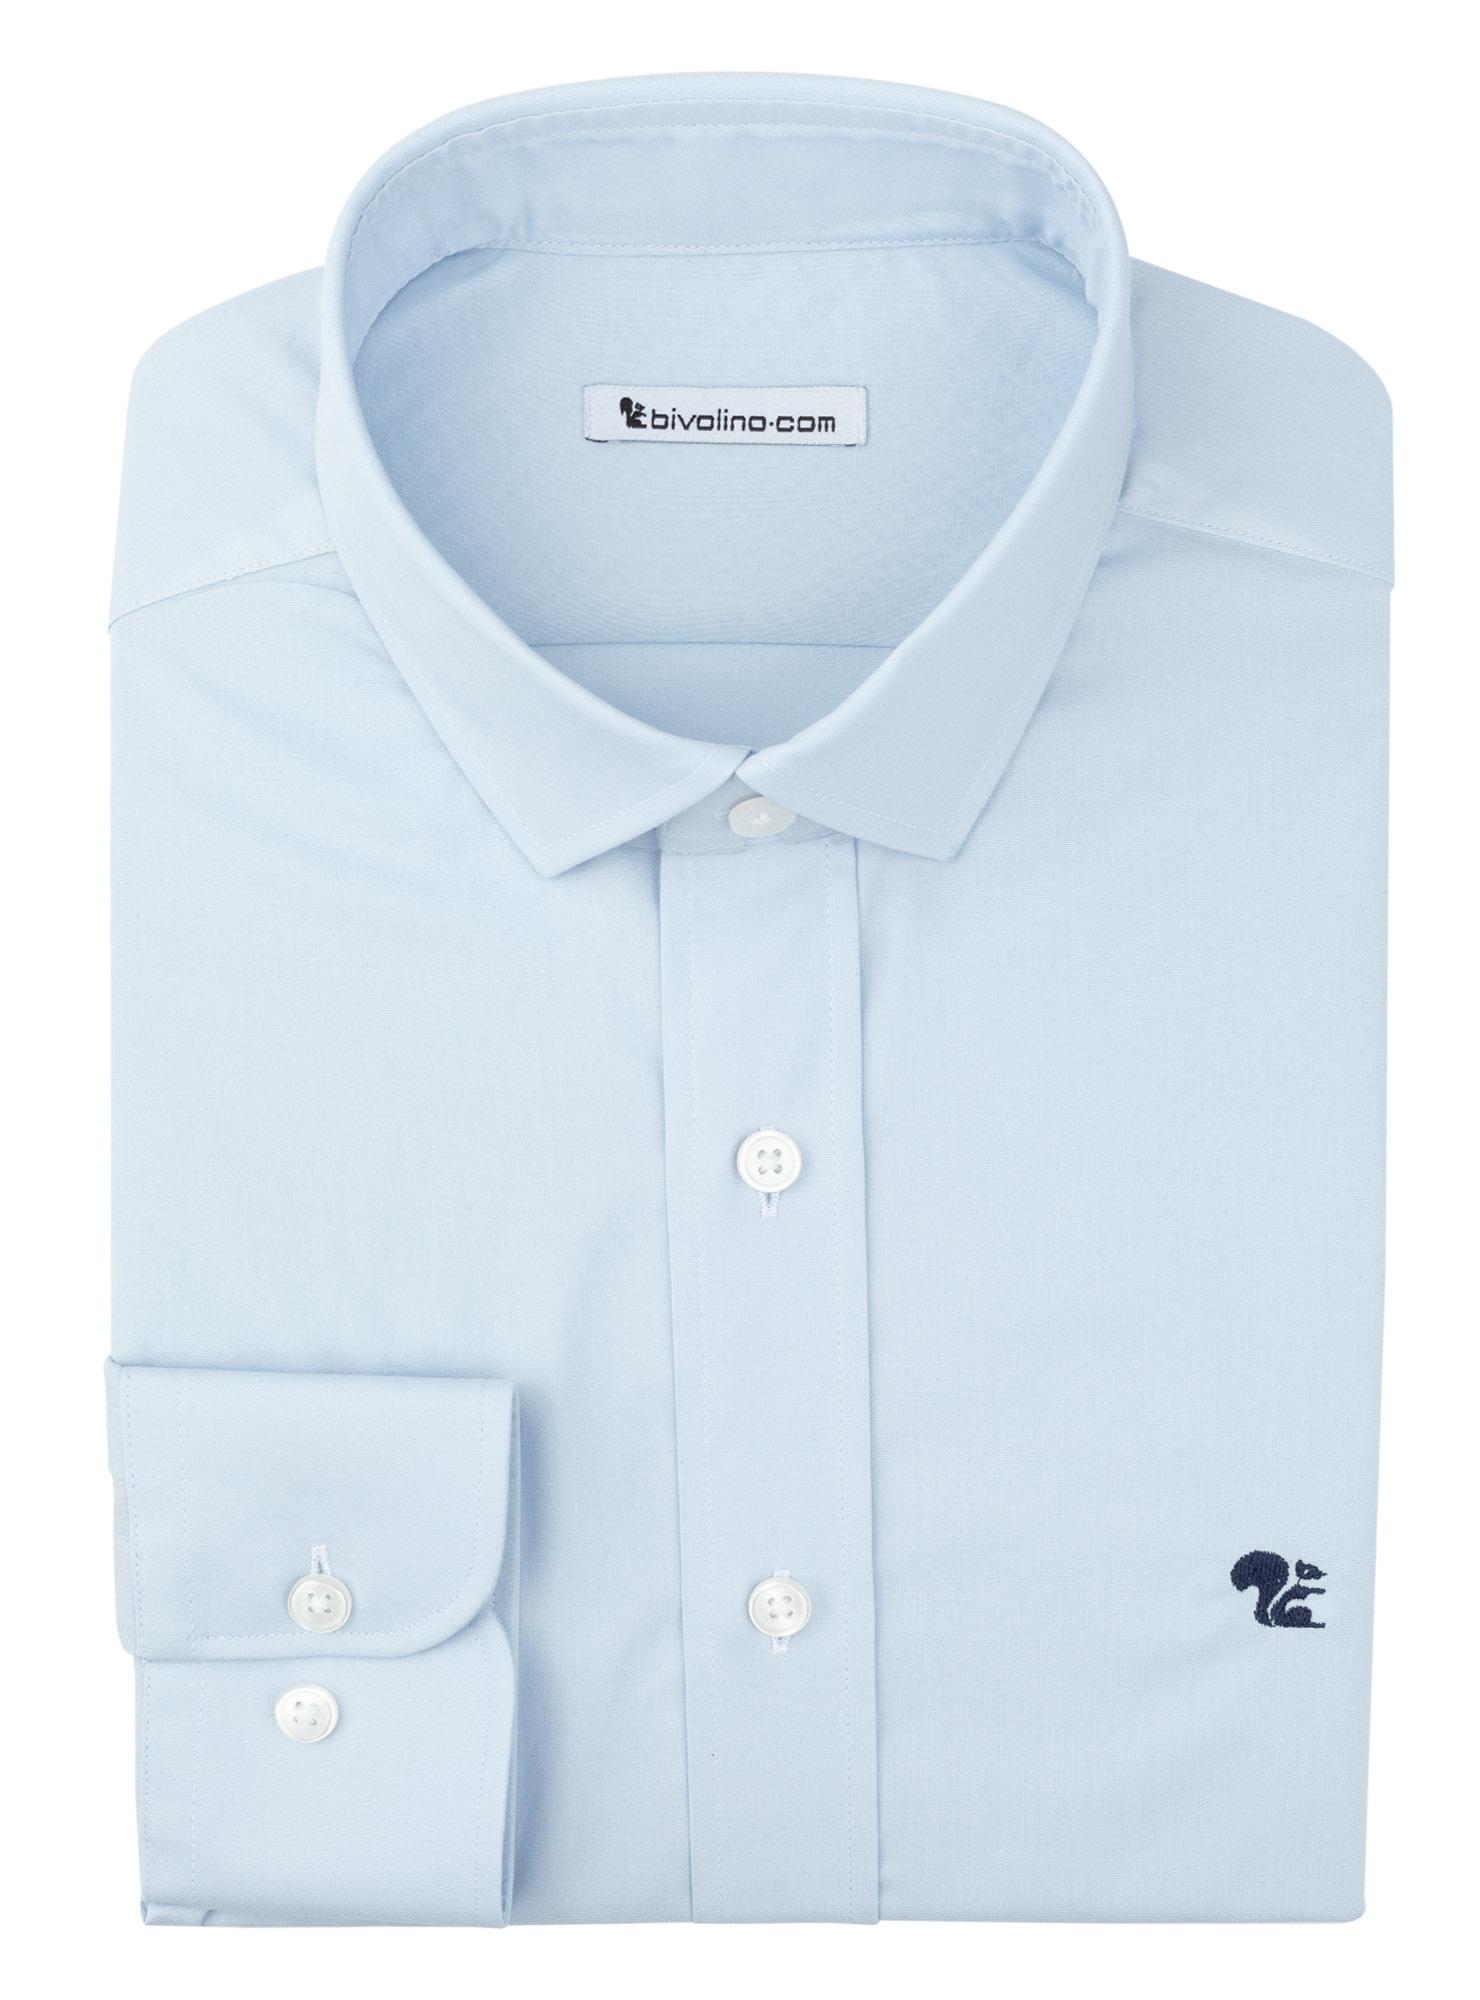 CILIBRIONE - Cotton Stretch Men's Shirt  - Reso 1